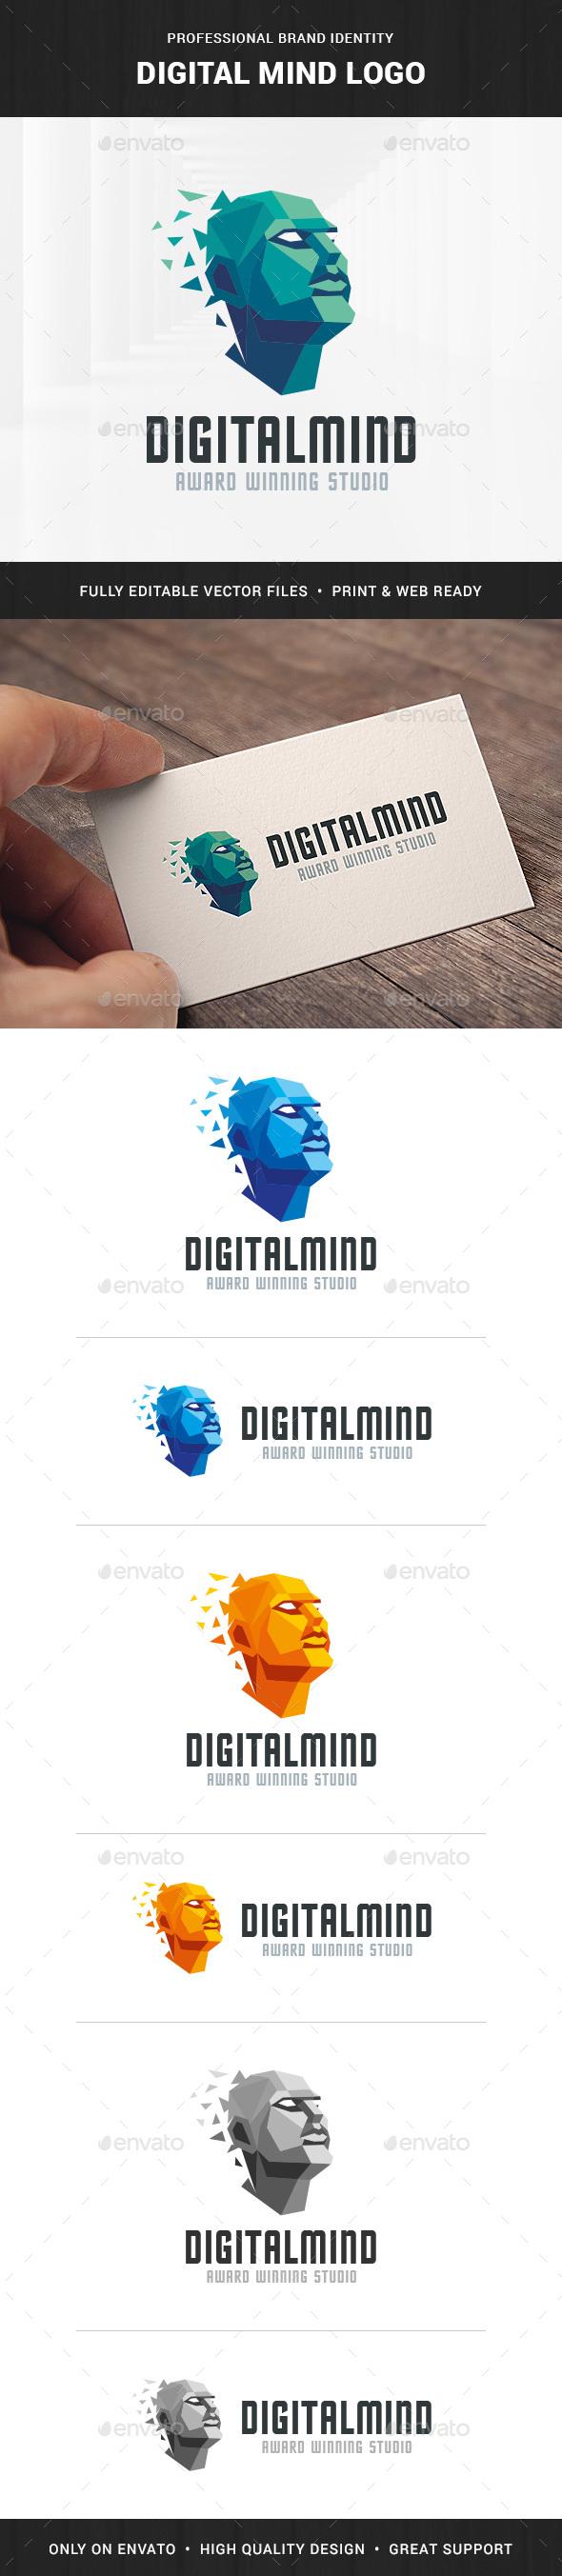 Digital Mind Logo Template